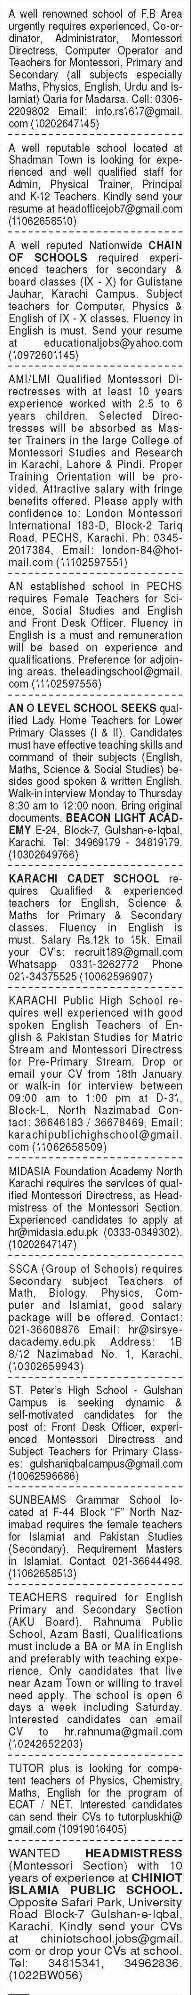 Daily Dawn Sunday Classified Teaching Staff Jobs 17 Jan 2021